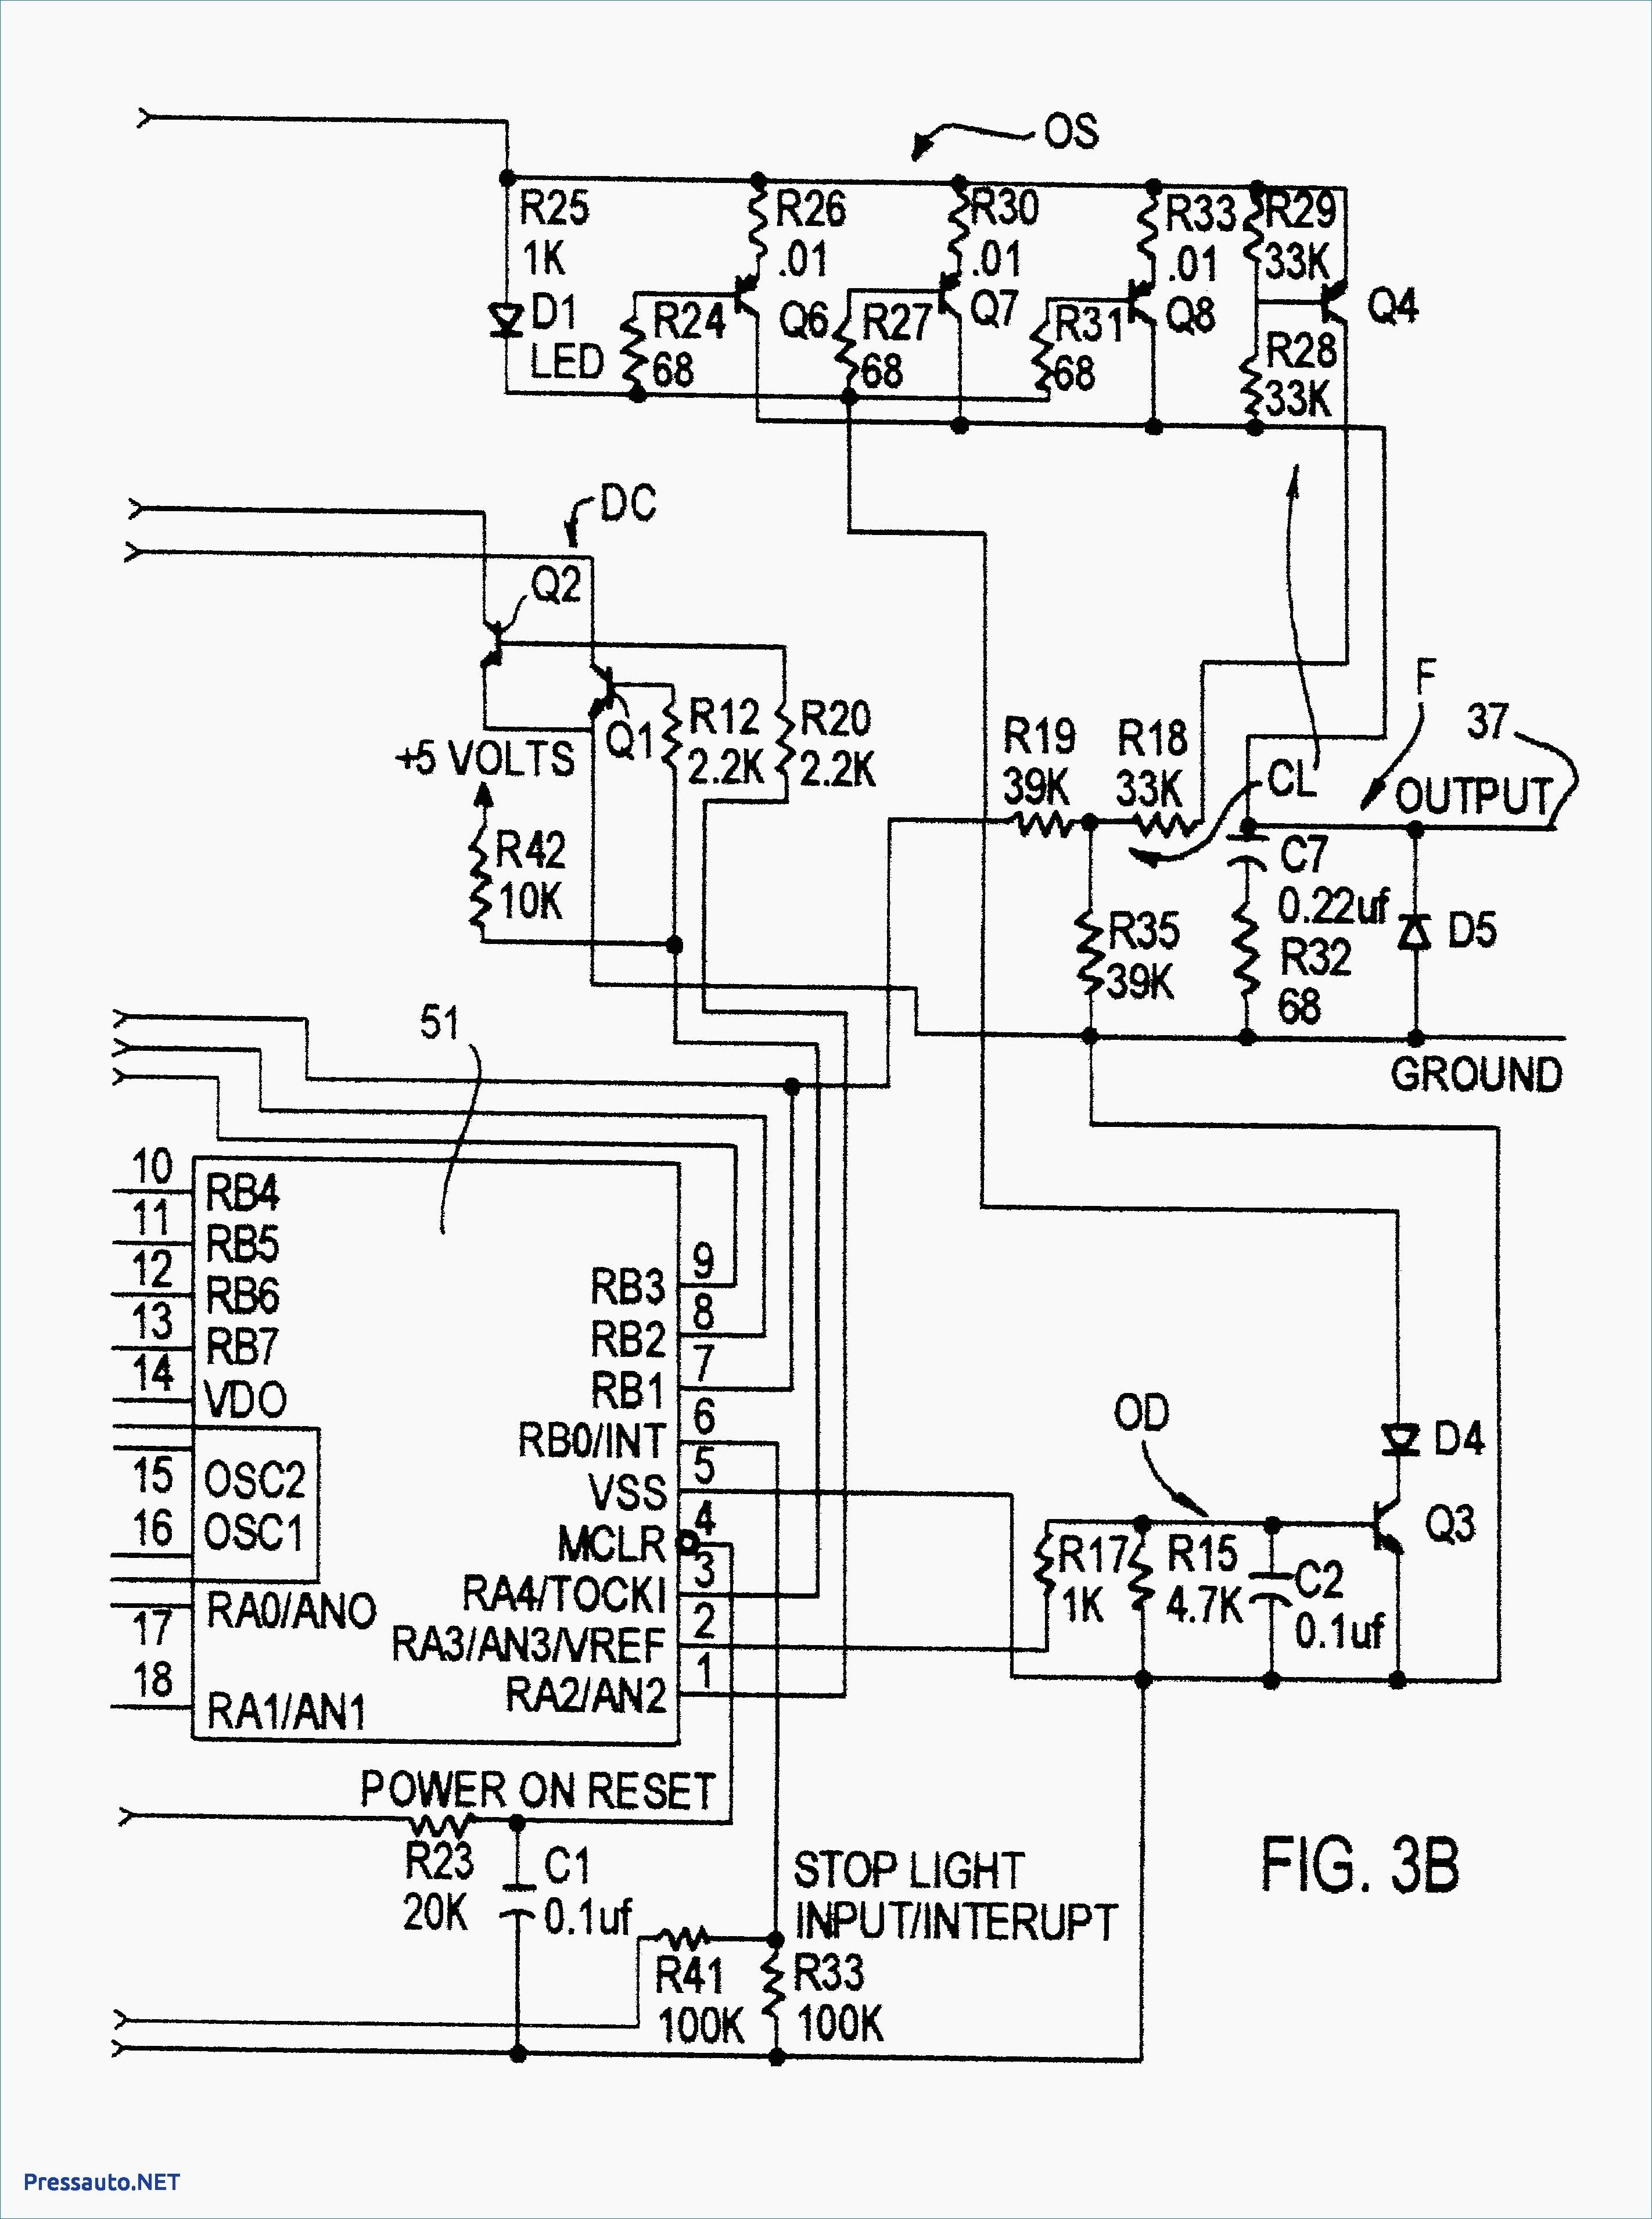 Wiring Diagram Trailer Marker Lights Car Hauler Utility Originalstylophone Of